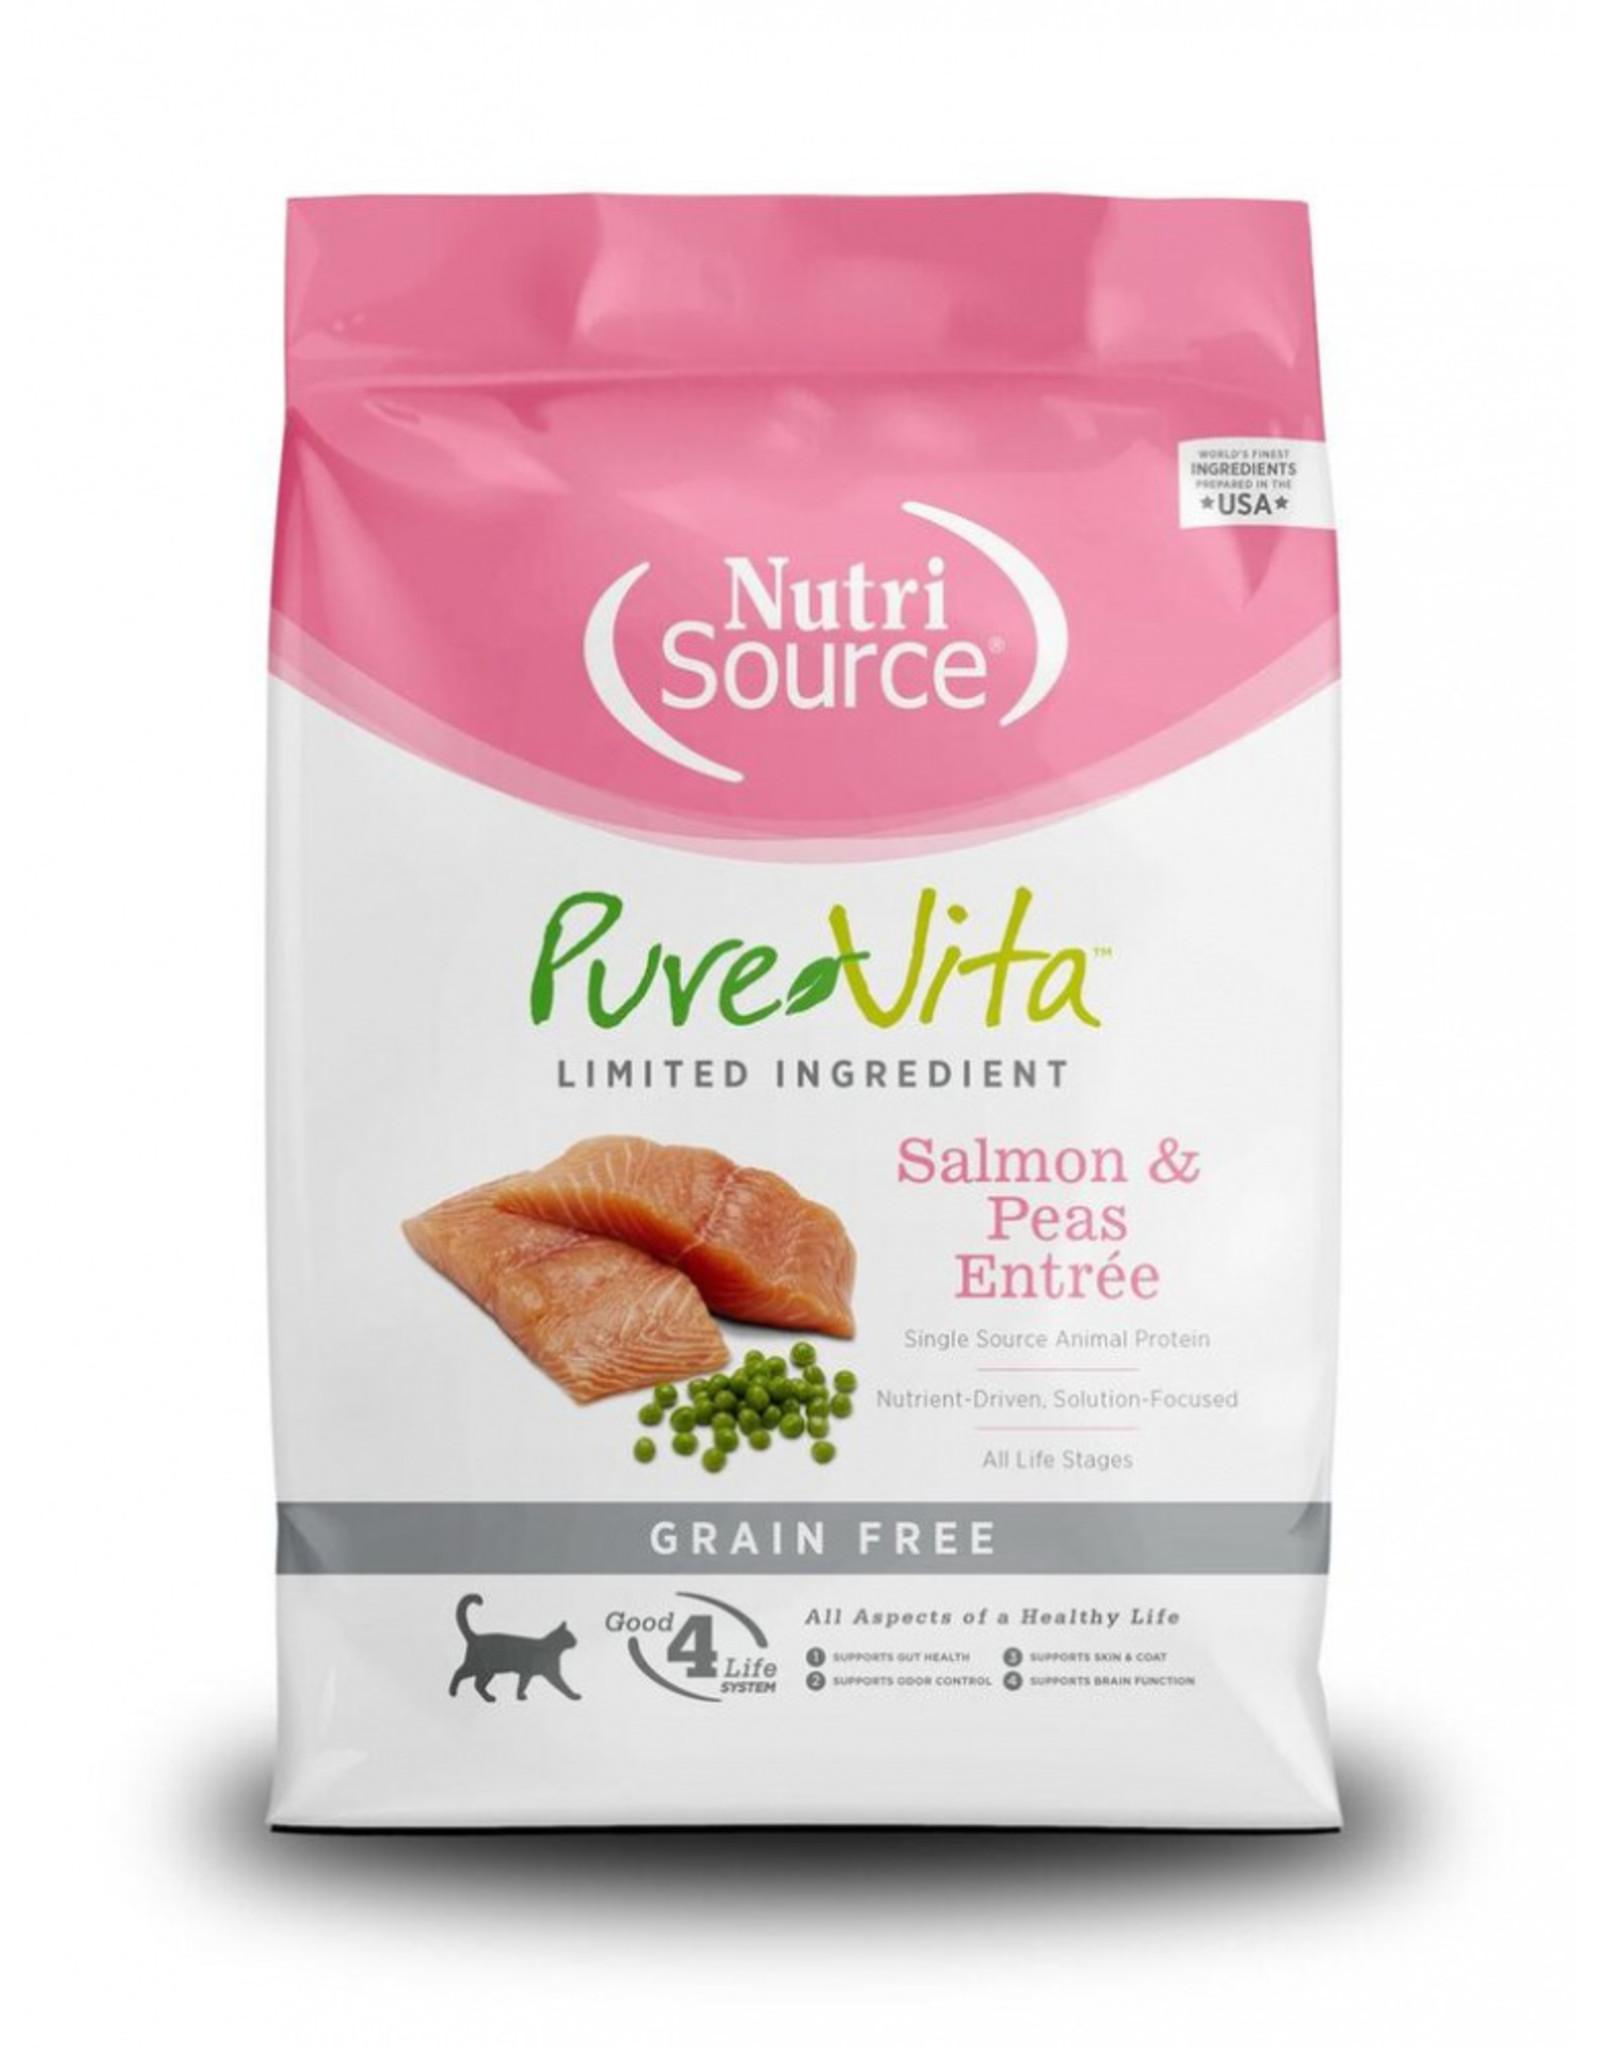 NutriSource Pet Foods PUREVITA CAT SALMON & PEAS ENTRÉE